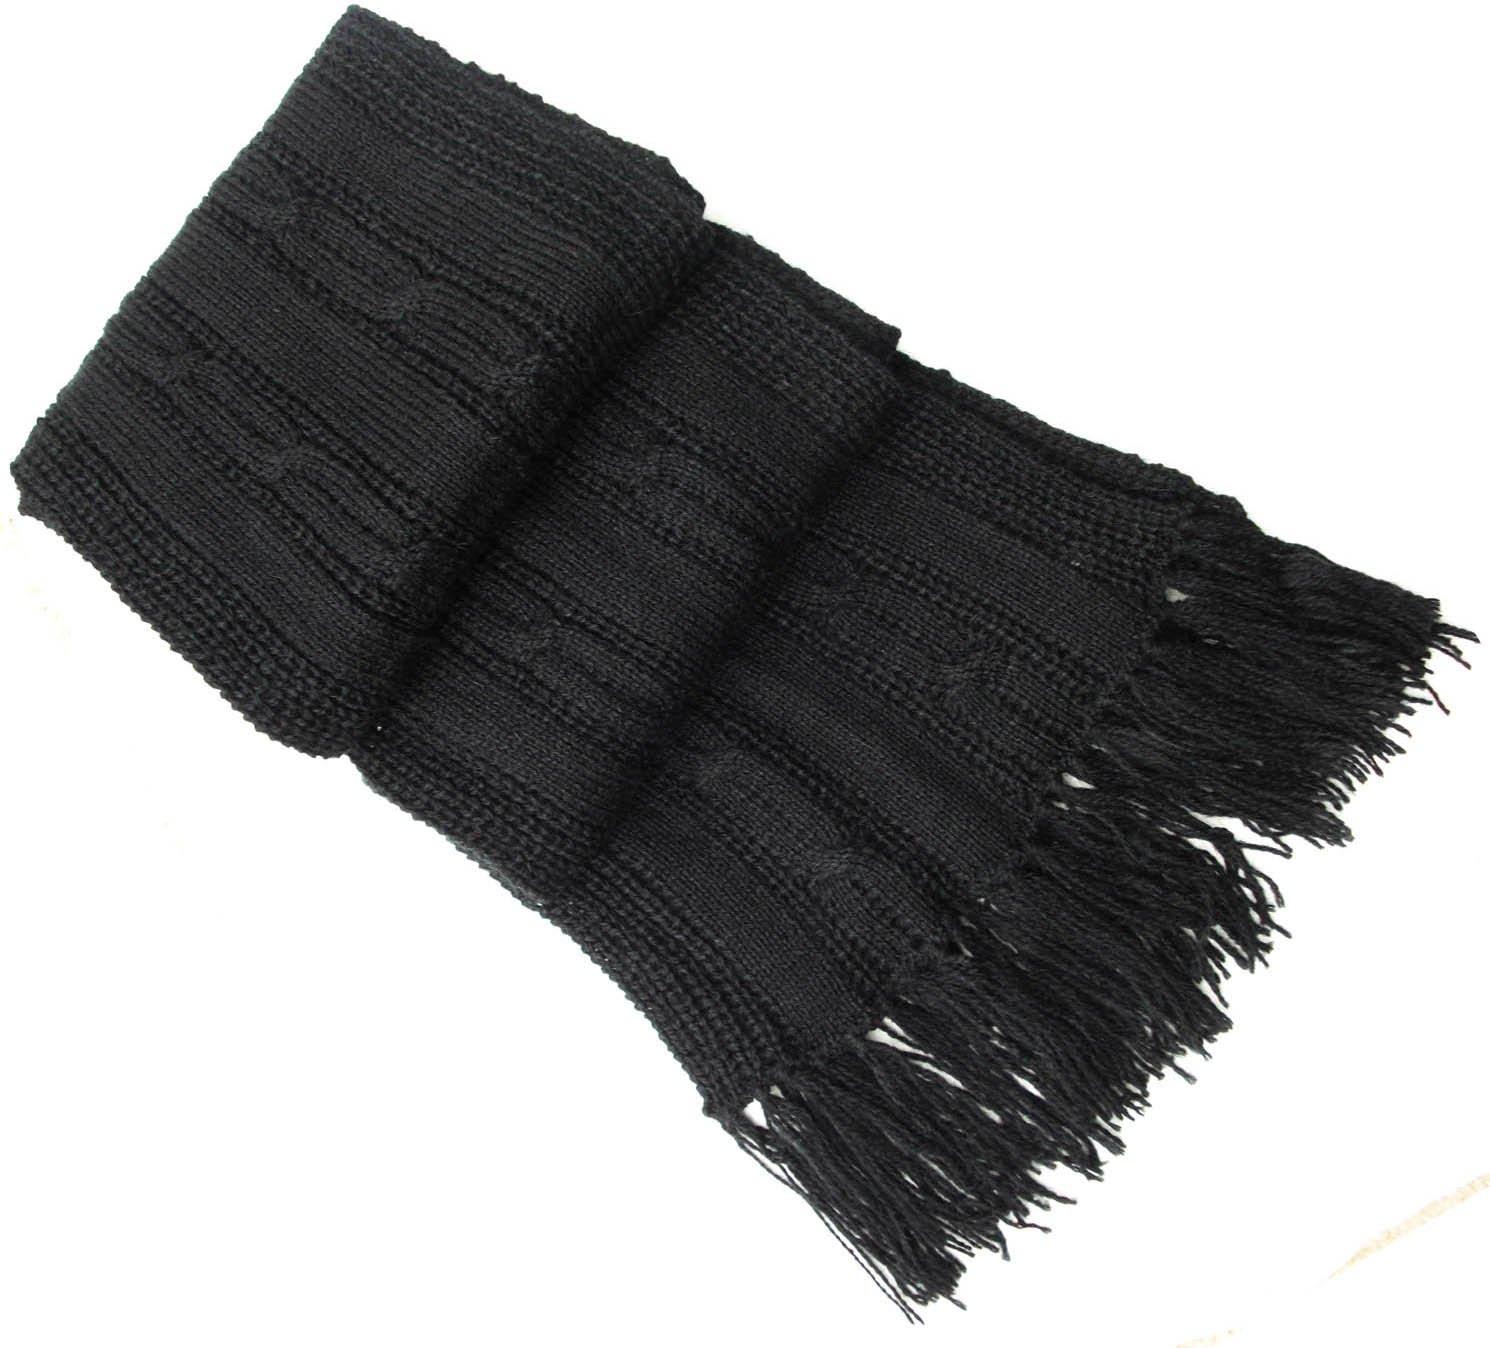 Handmade PURE ALPACA NATURAL FIBER Cable Scarf - Elegant Black